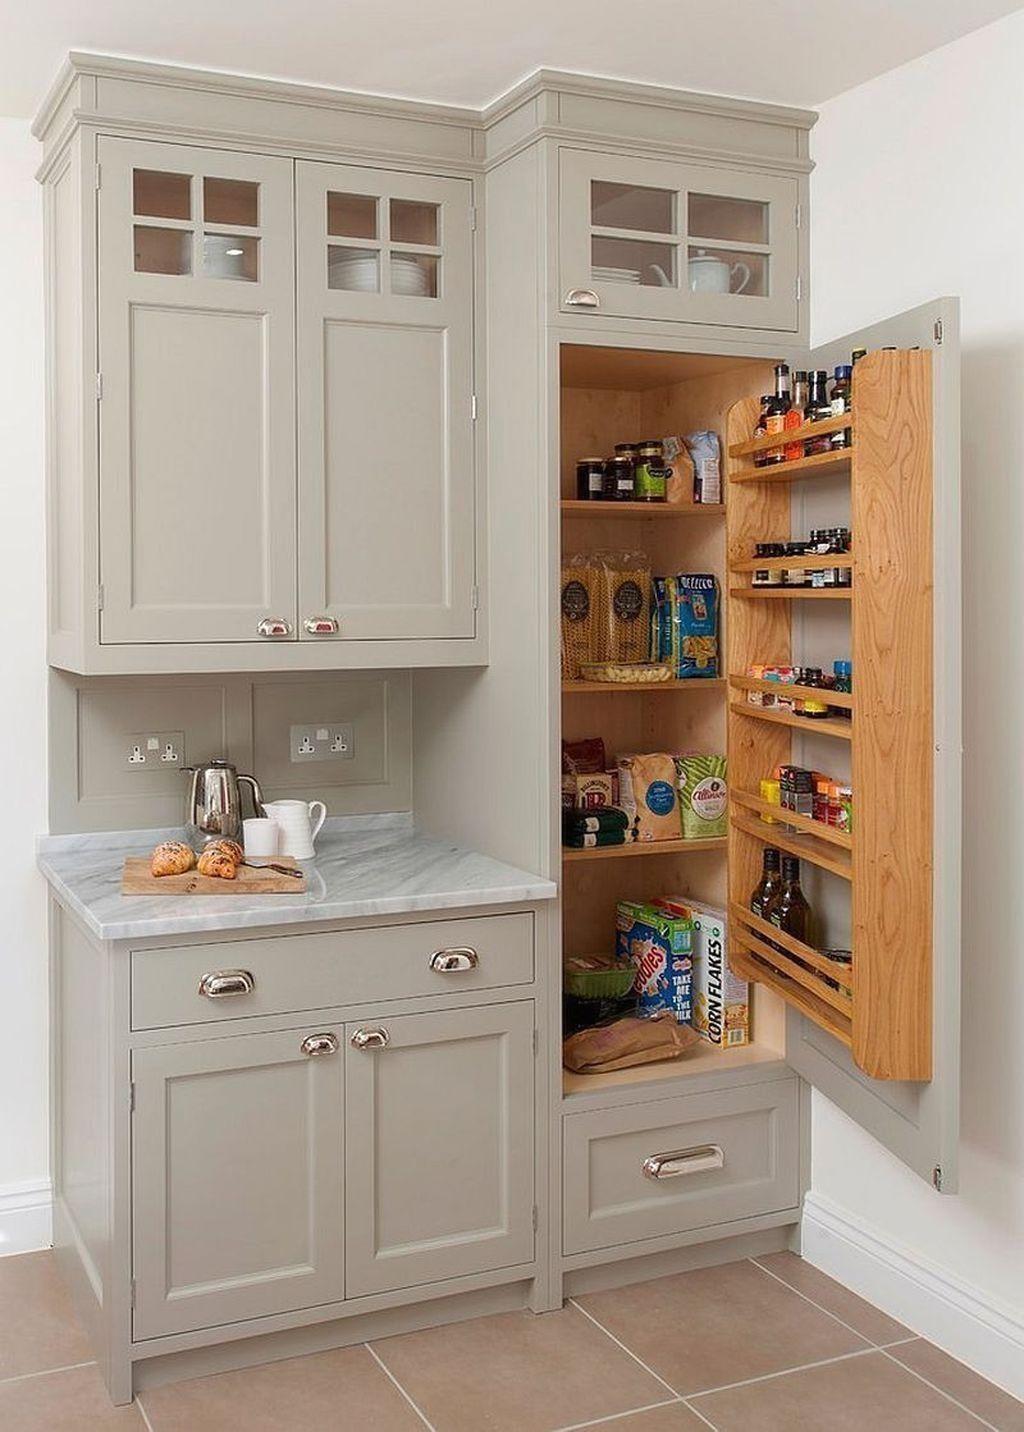 Amazing Diy Kitchen Cabinets Plans Dreamkitchen Kitchen Cabinet Plans Kitchen Remodel Small Traditional Kitchen Cabinets